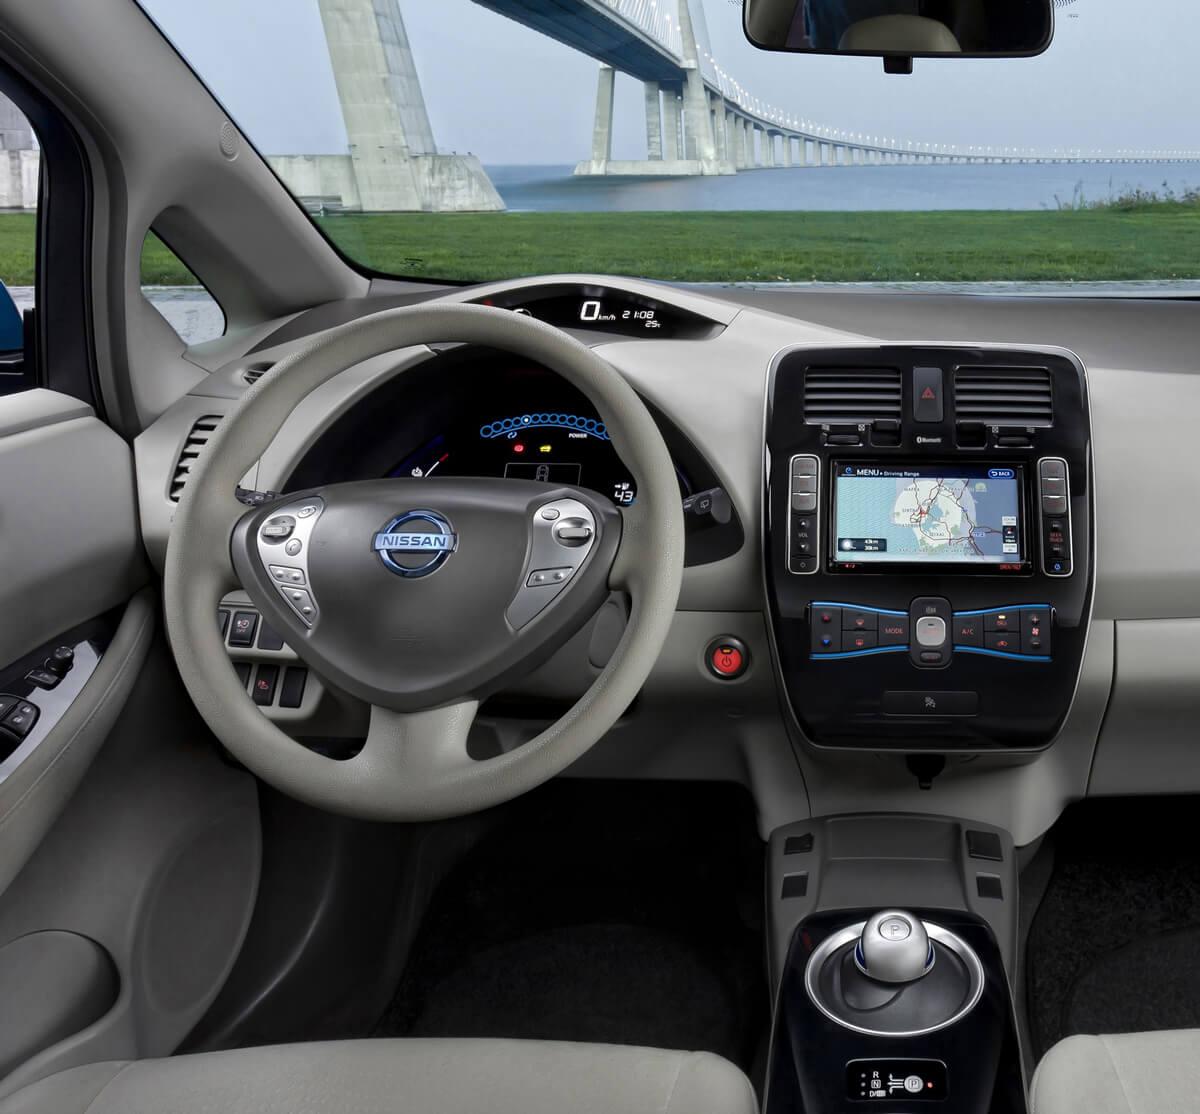 Nissan Leaf 24 kWh 2011 2012 2013 interior